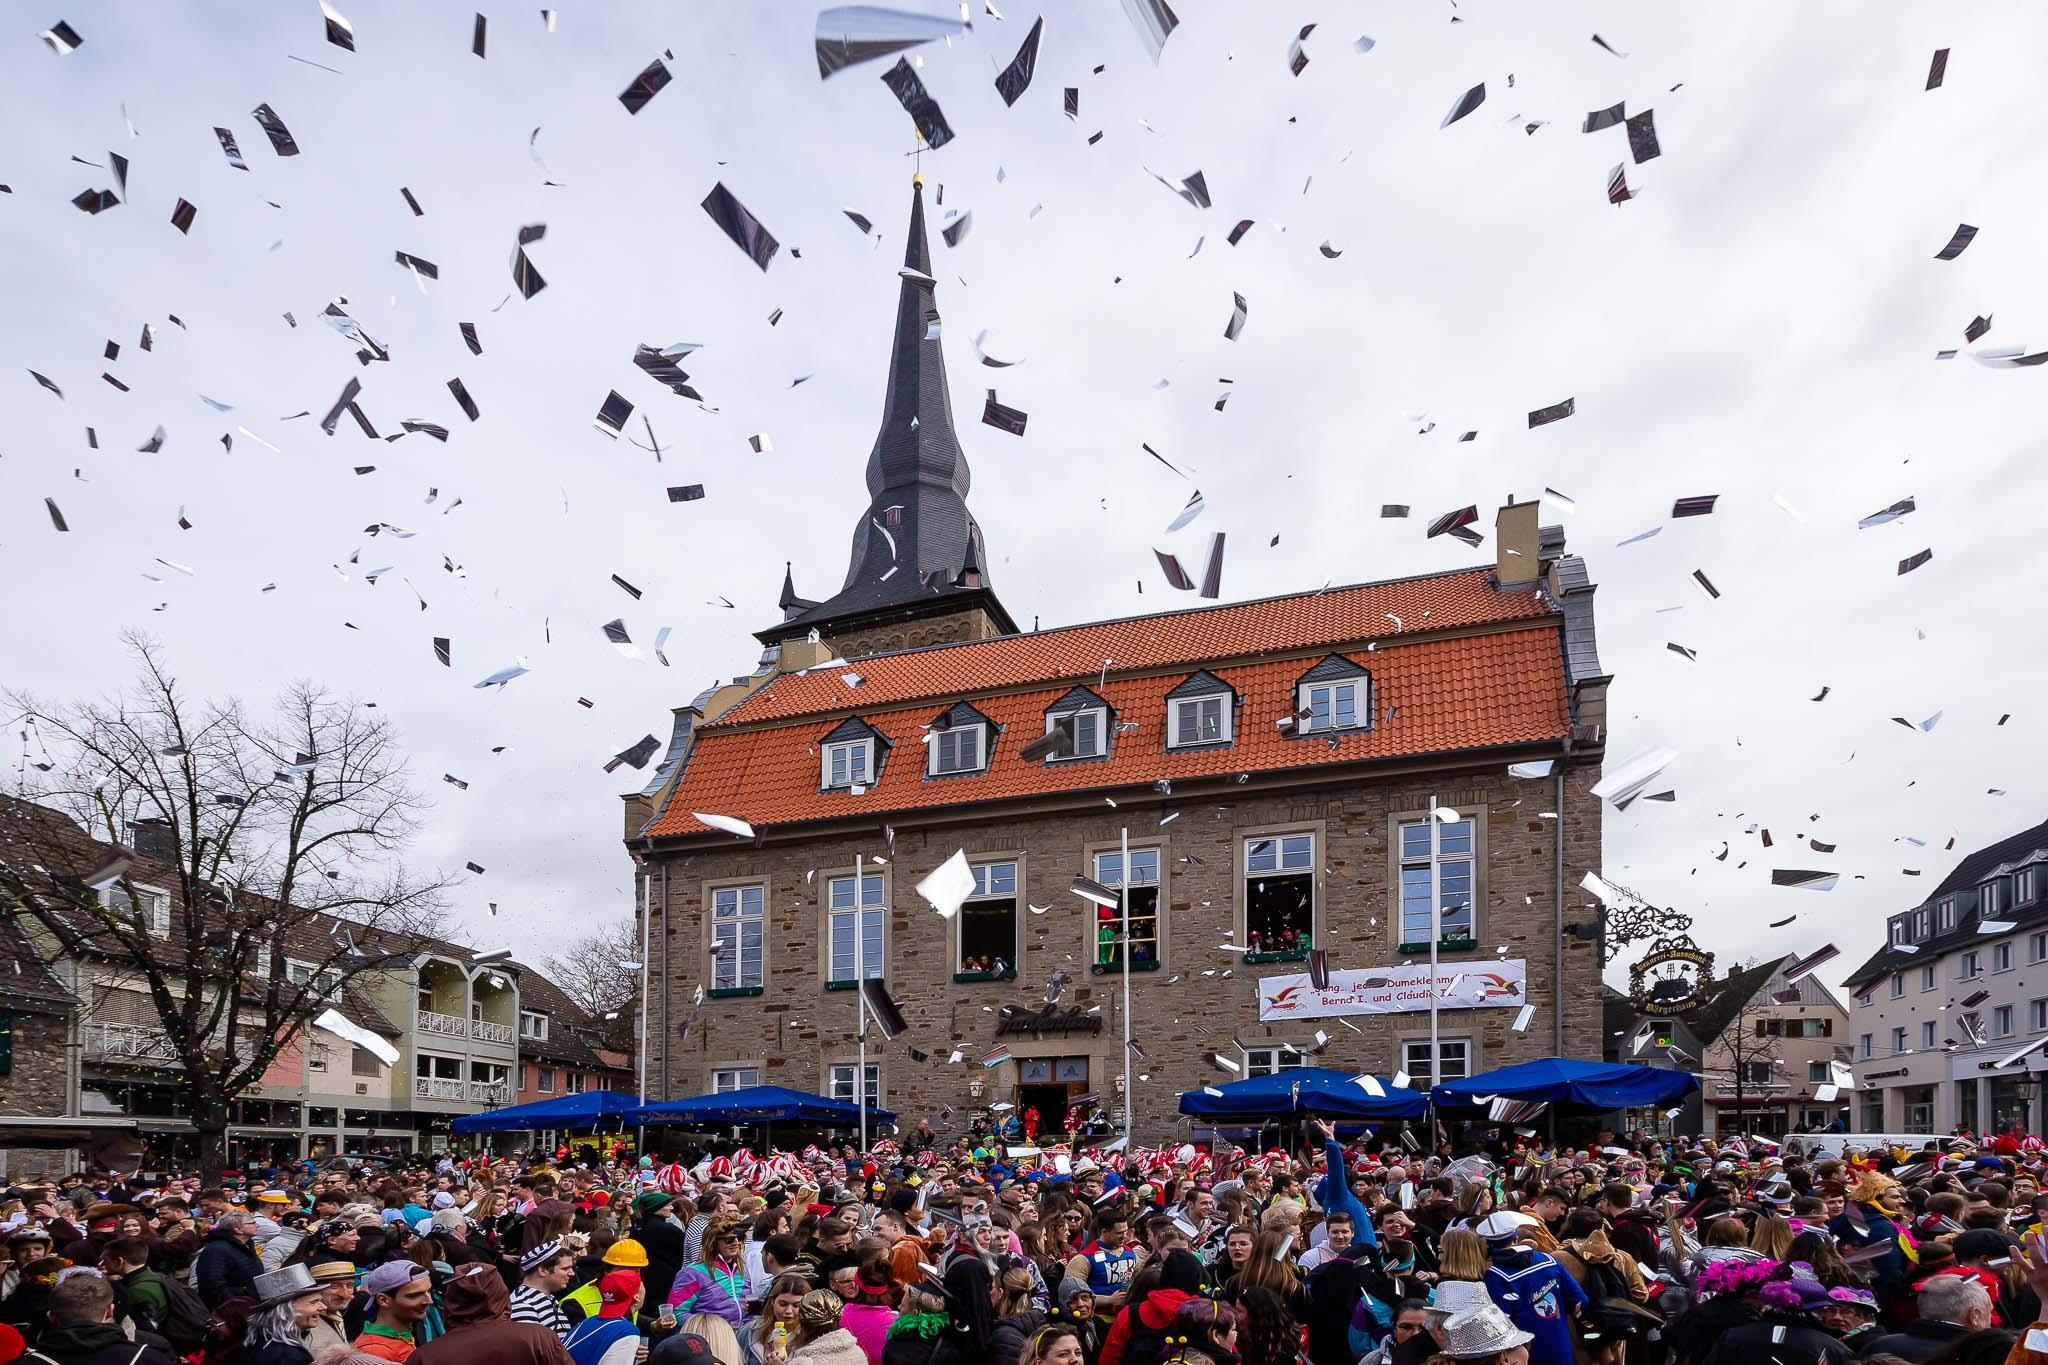 Altweiber 2020 Party Marktplatz Ratingen